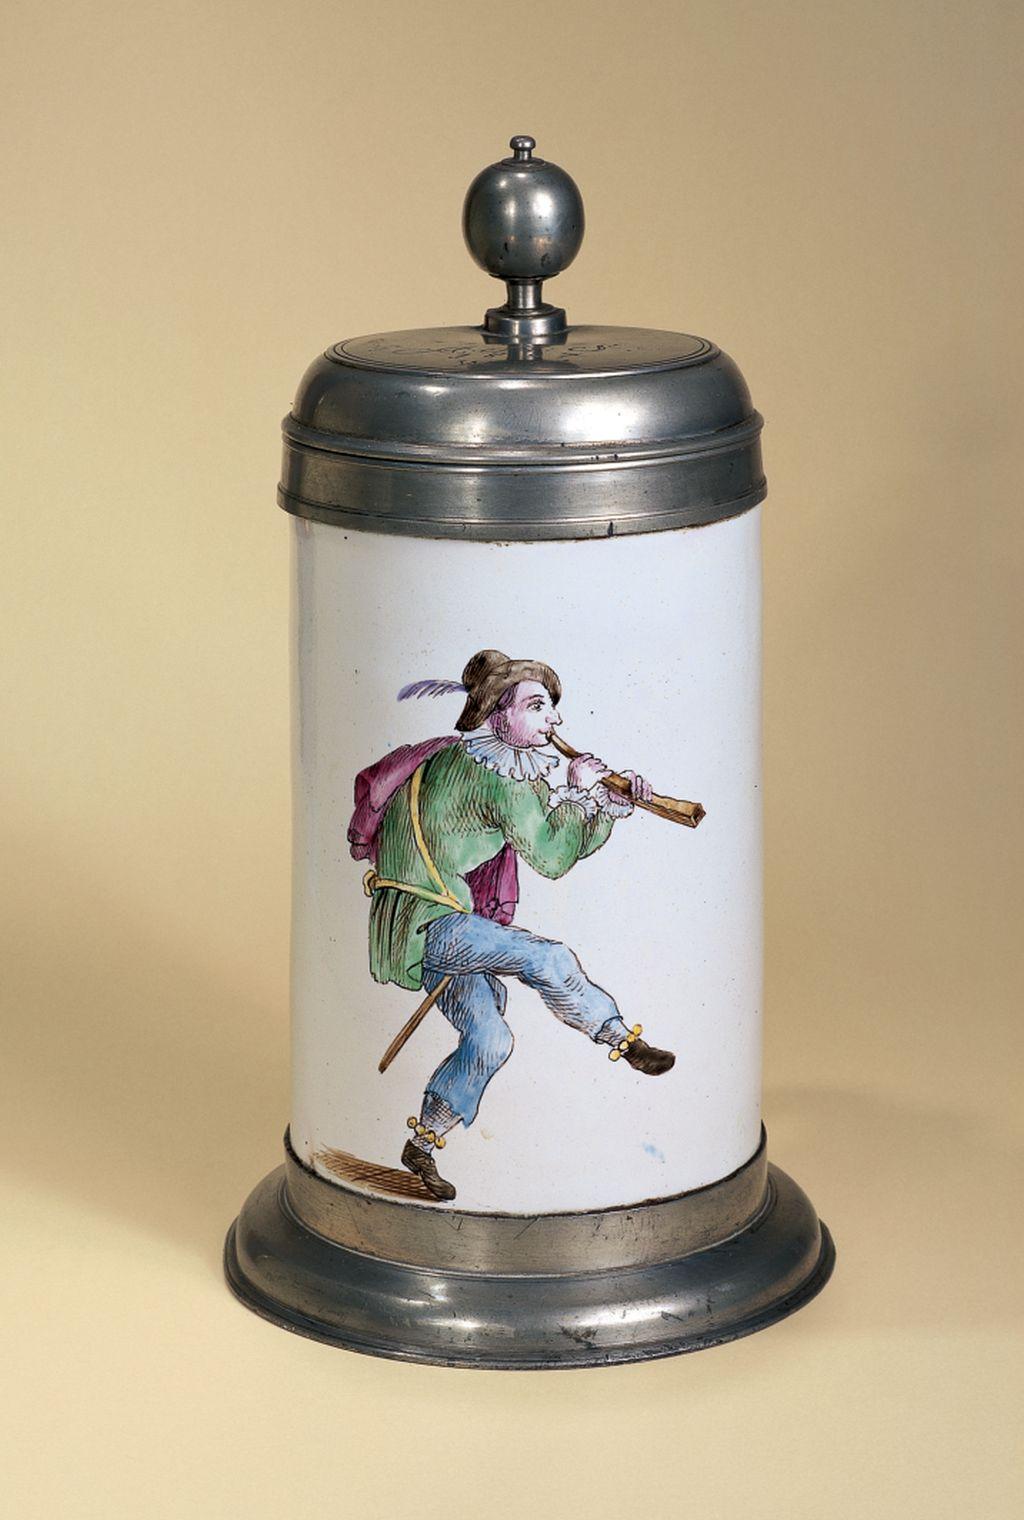 proskau-fayence-walzenkrug-musikanten-um-1800